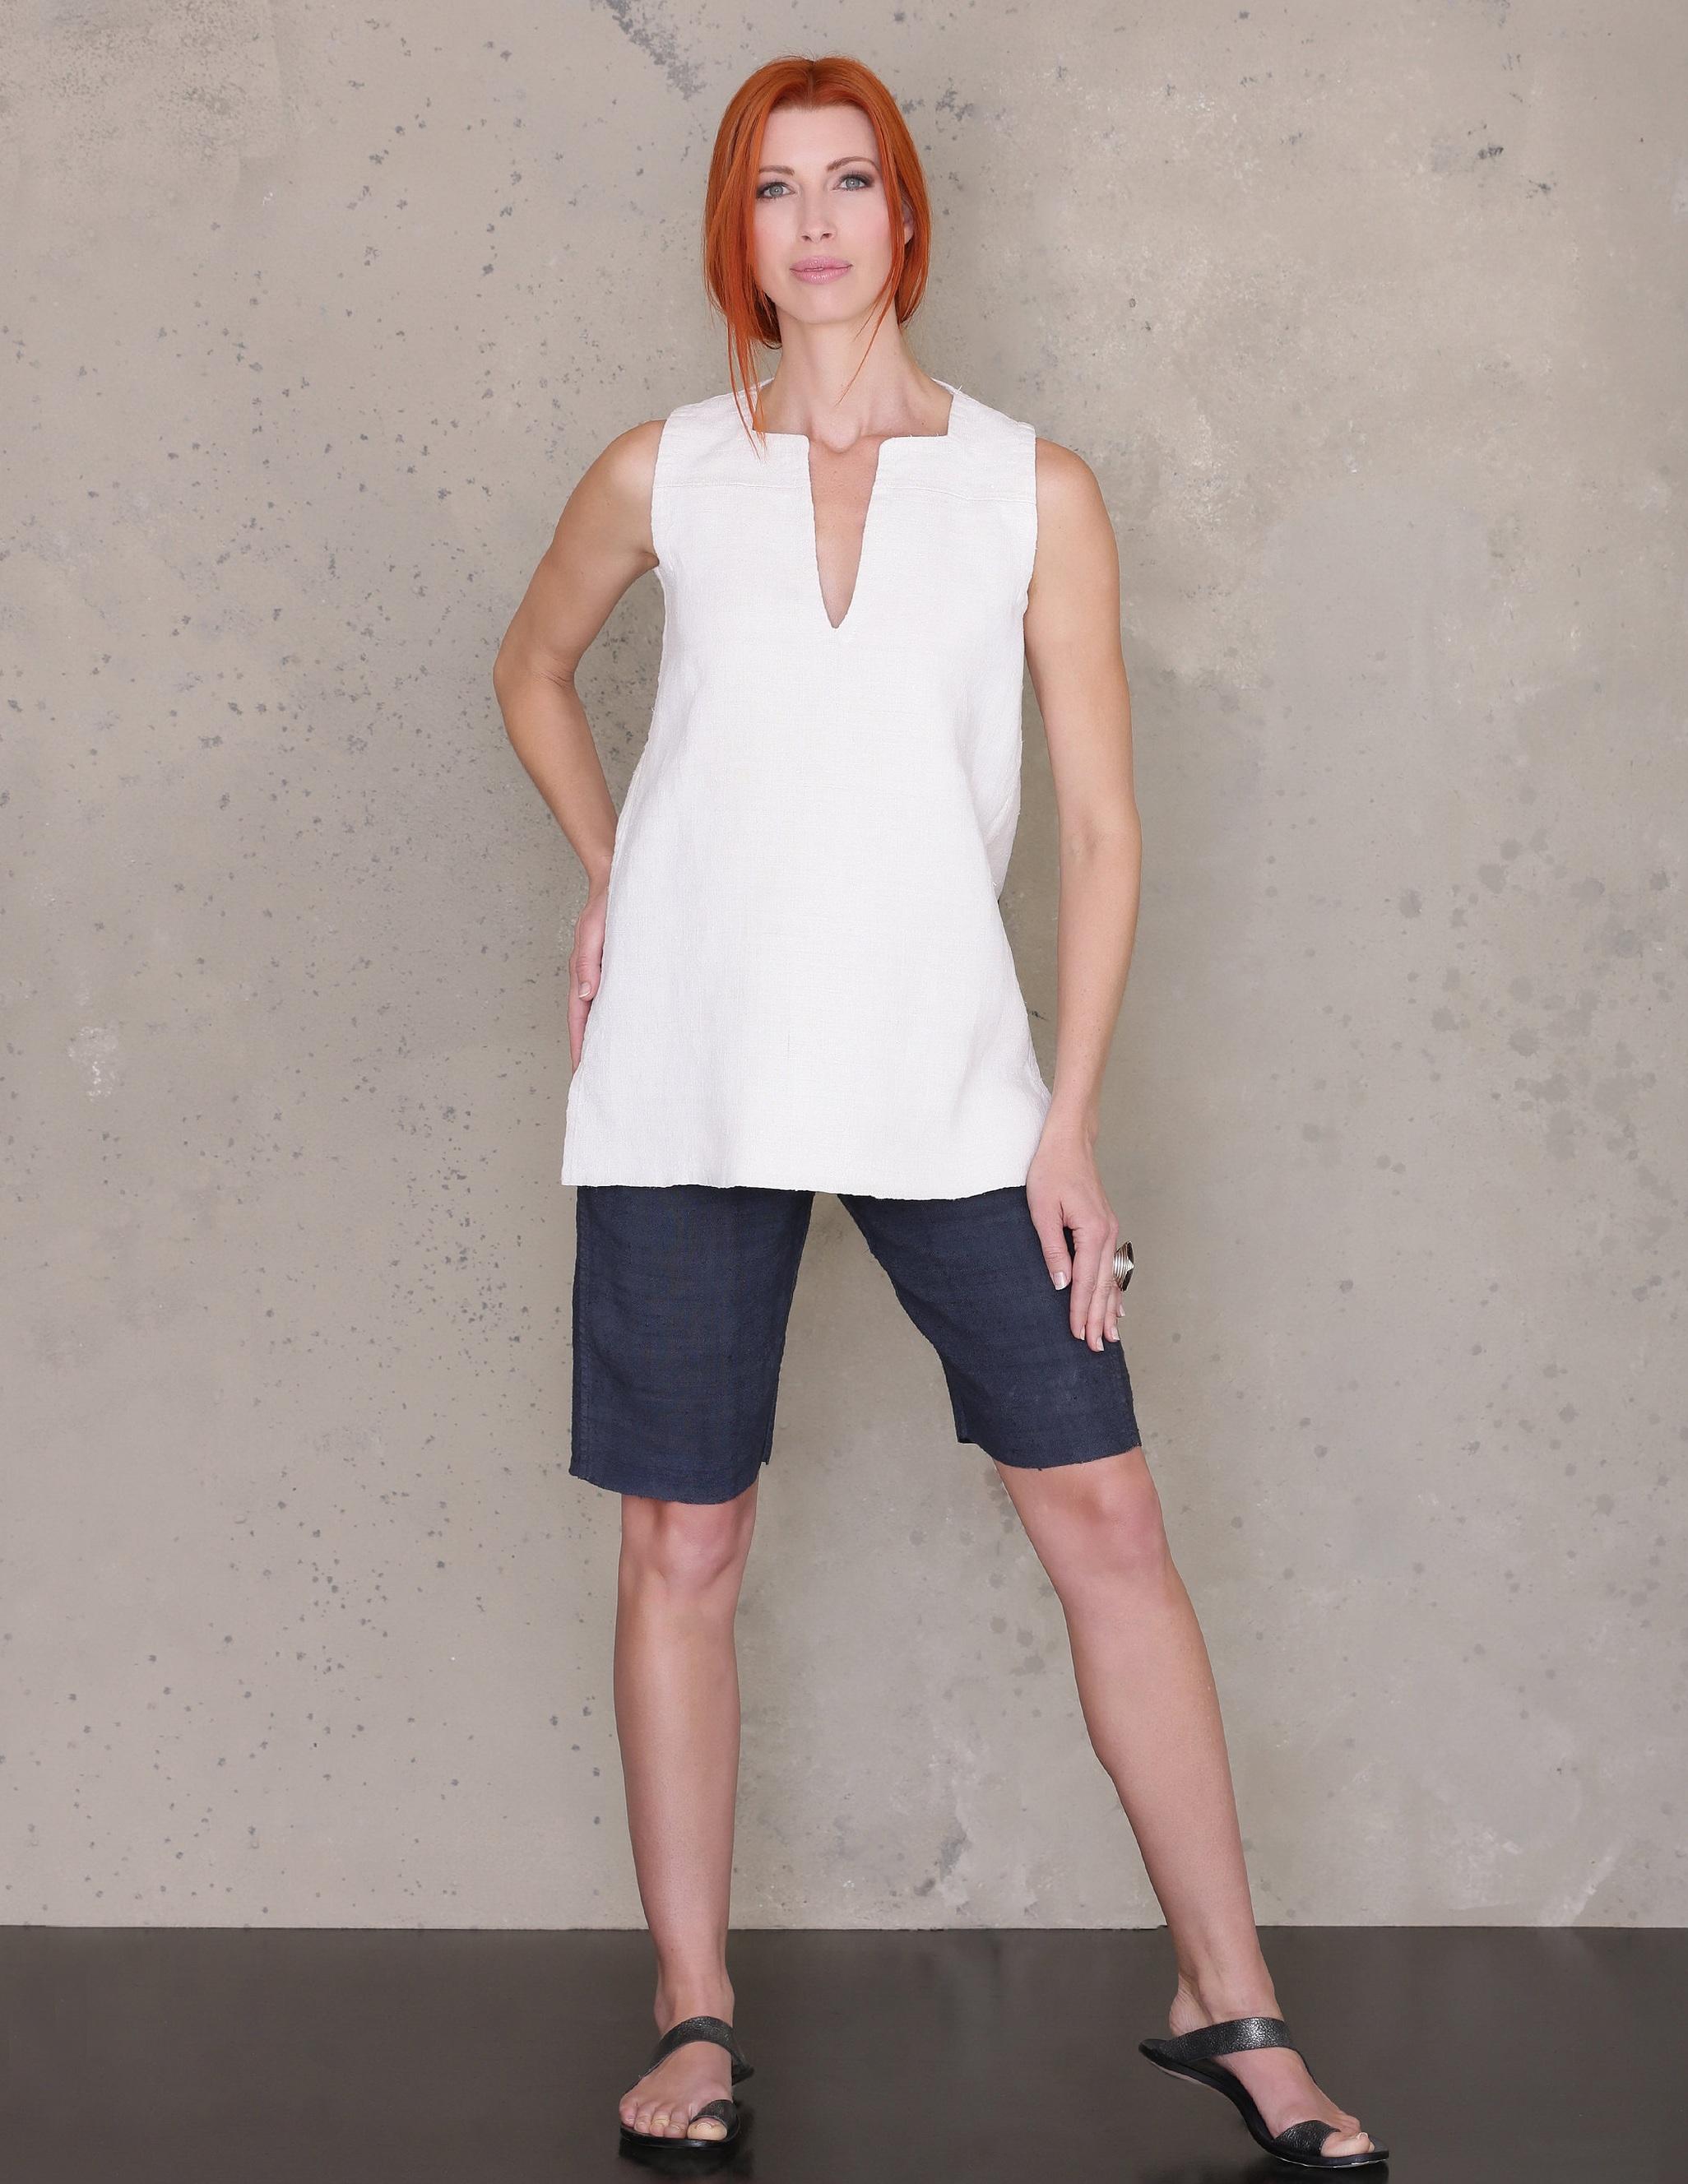 ann-normandy-design-bermuda-shorts-sewing-pattern.jpg